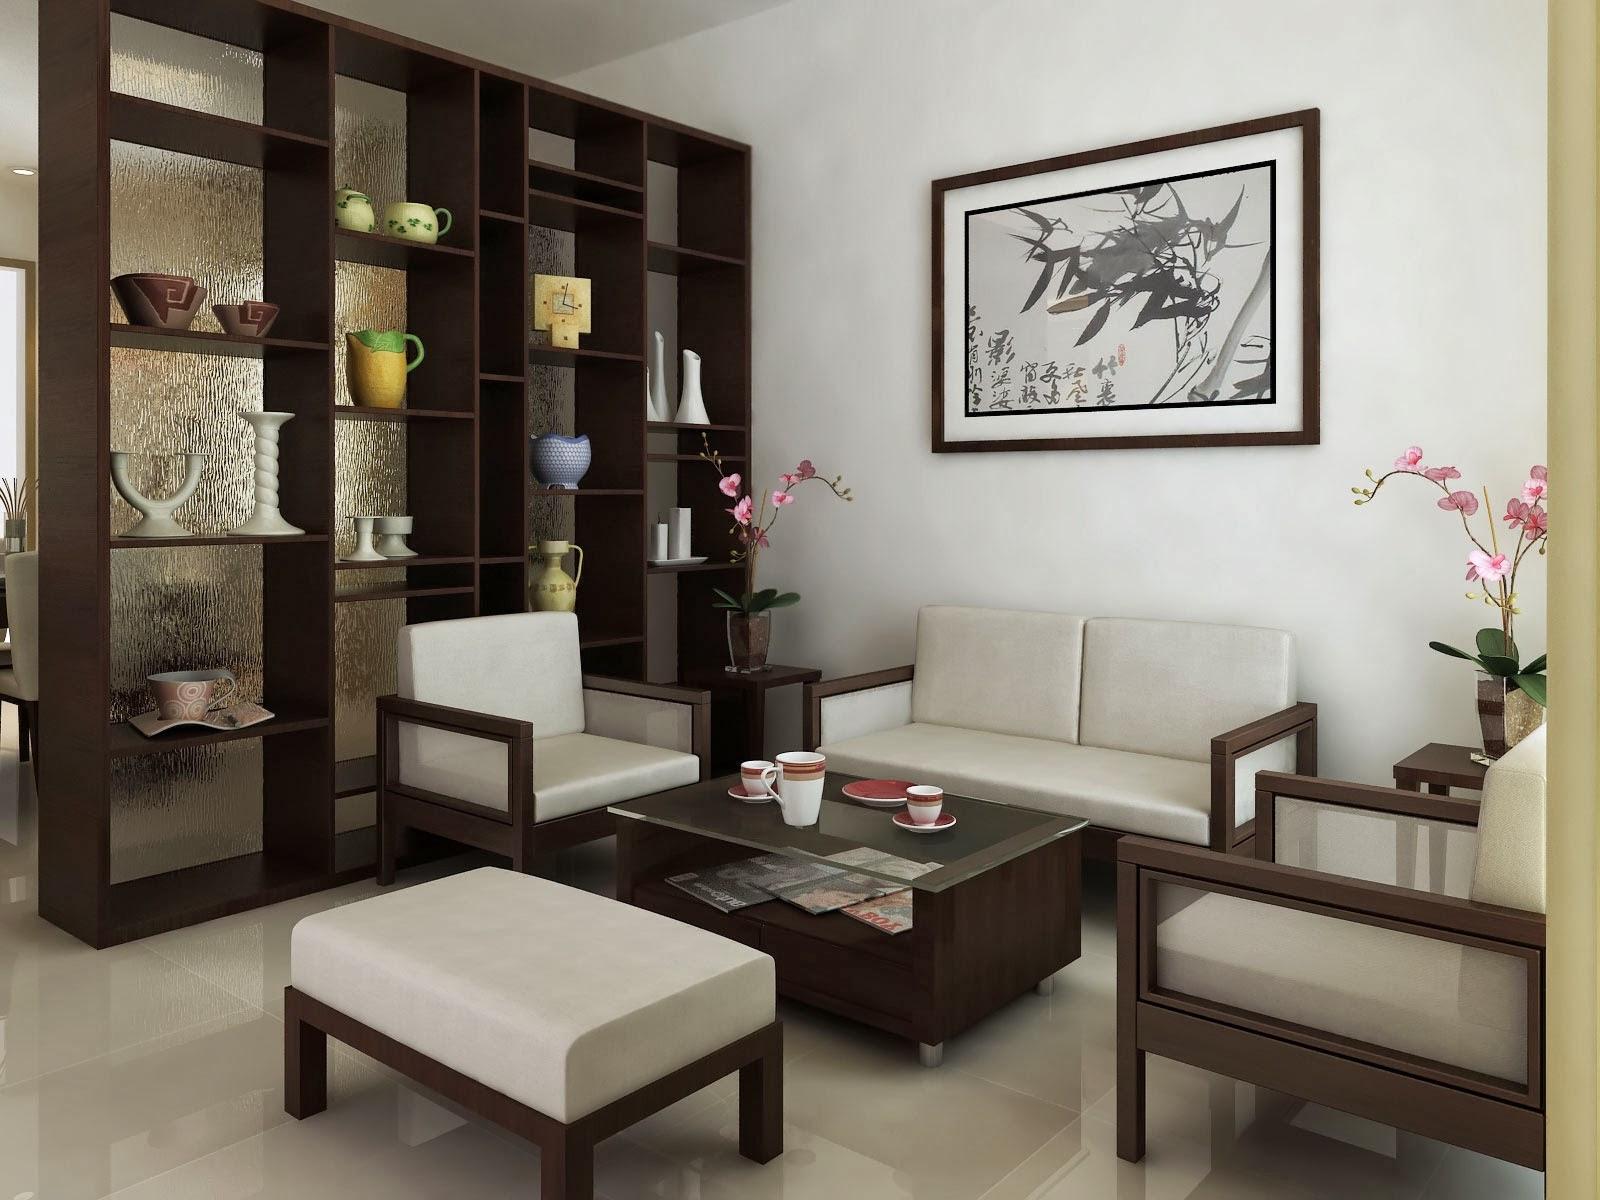 Gambaran Desain Rumah Minimalis Mungil Lengkap Dengan Interiornya